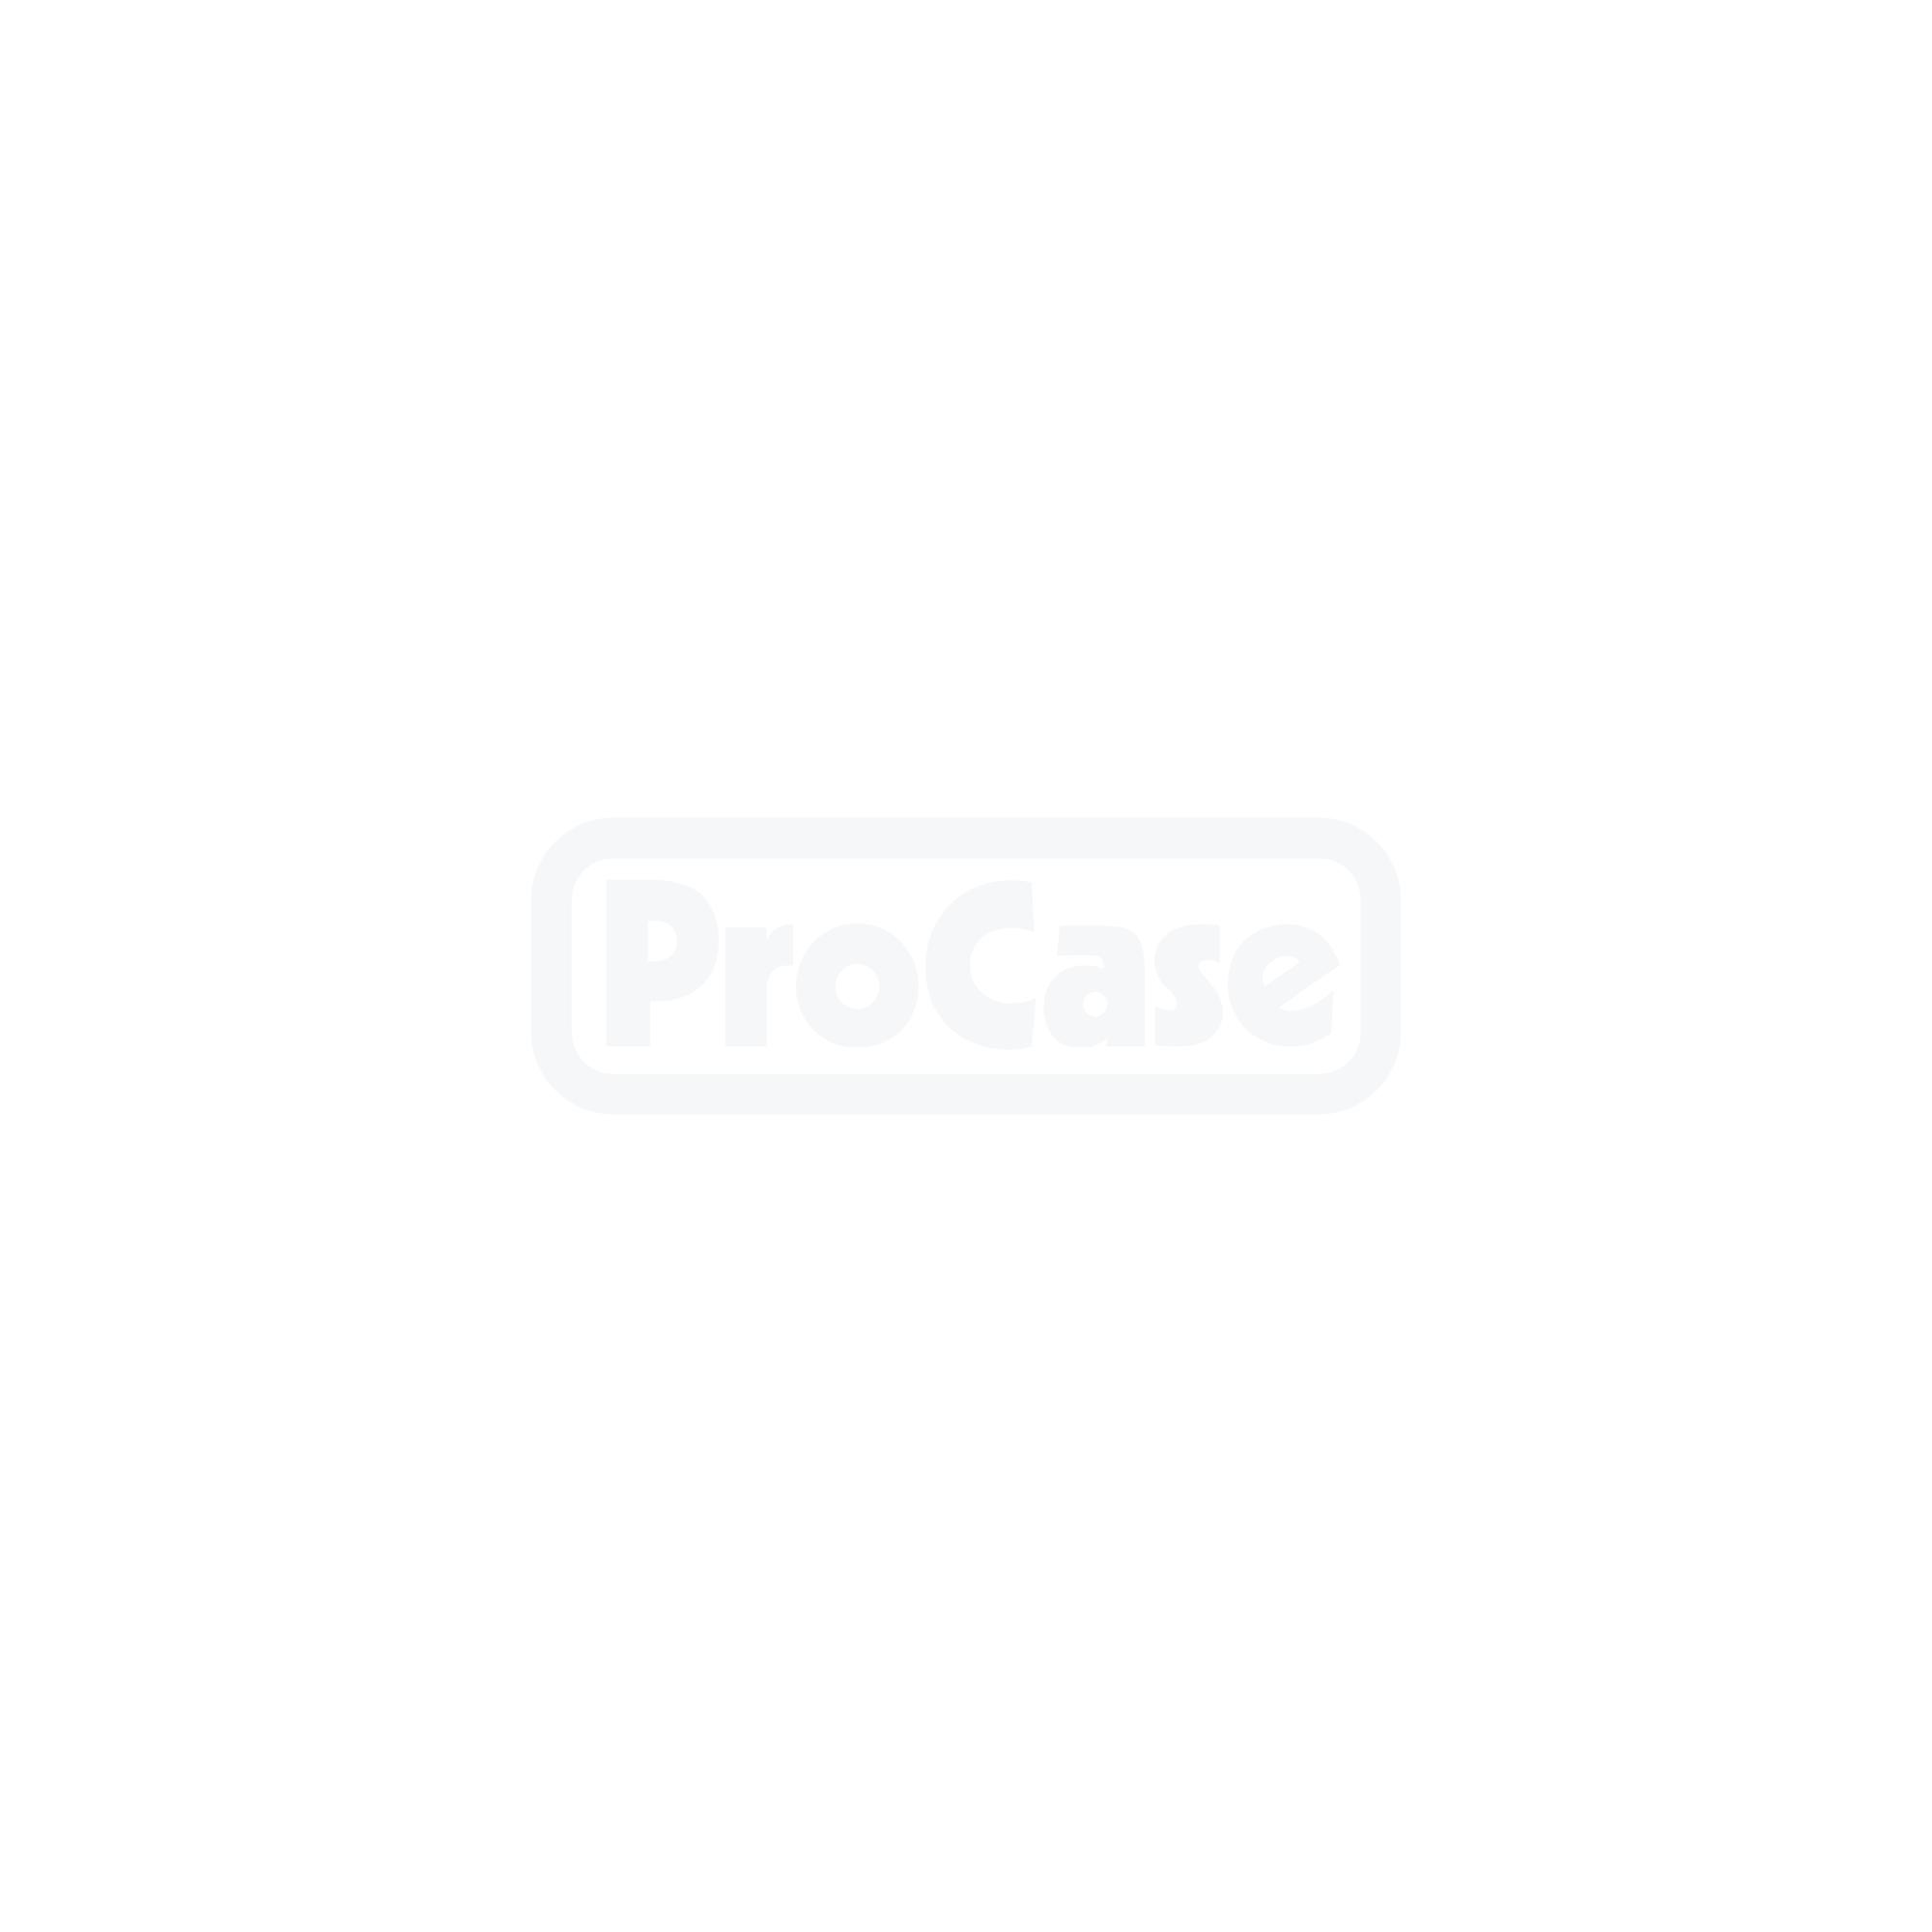 Flightcase für 2 d&b audiotechnik Z5390 Y Flugrahmen 2